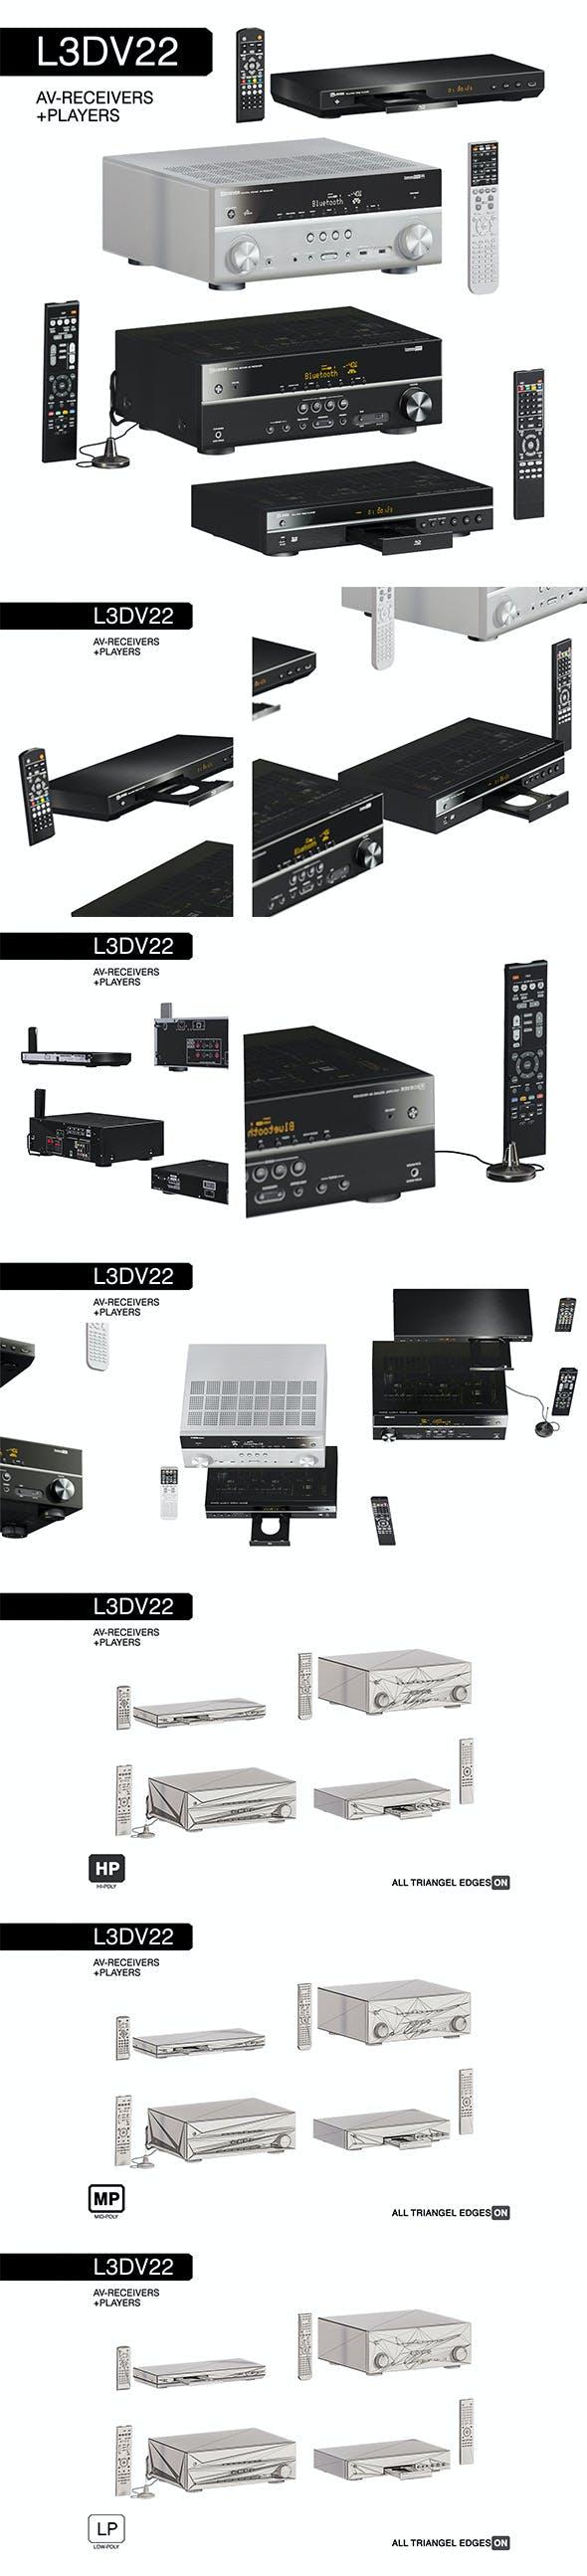 L3DV22G01 - av-receivers players rcs set - 3DOcean Item for Sale